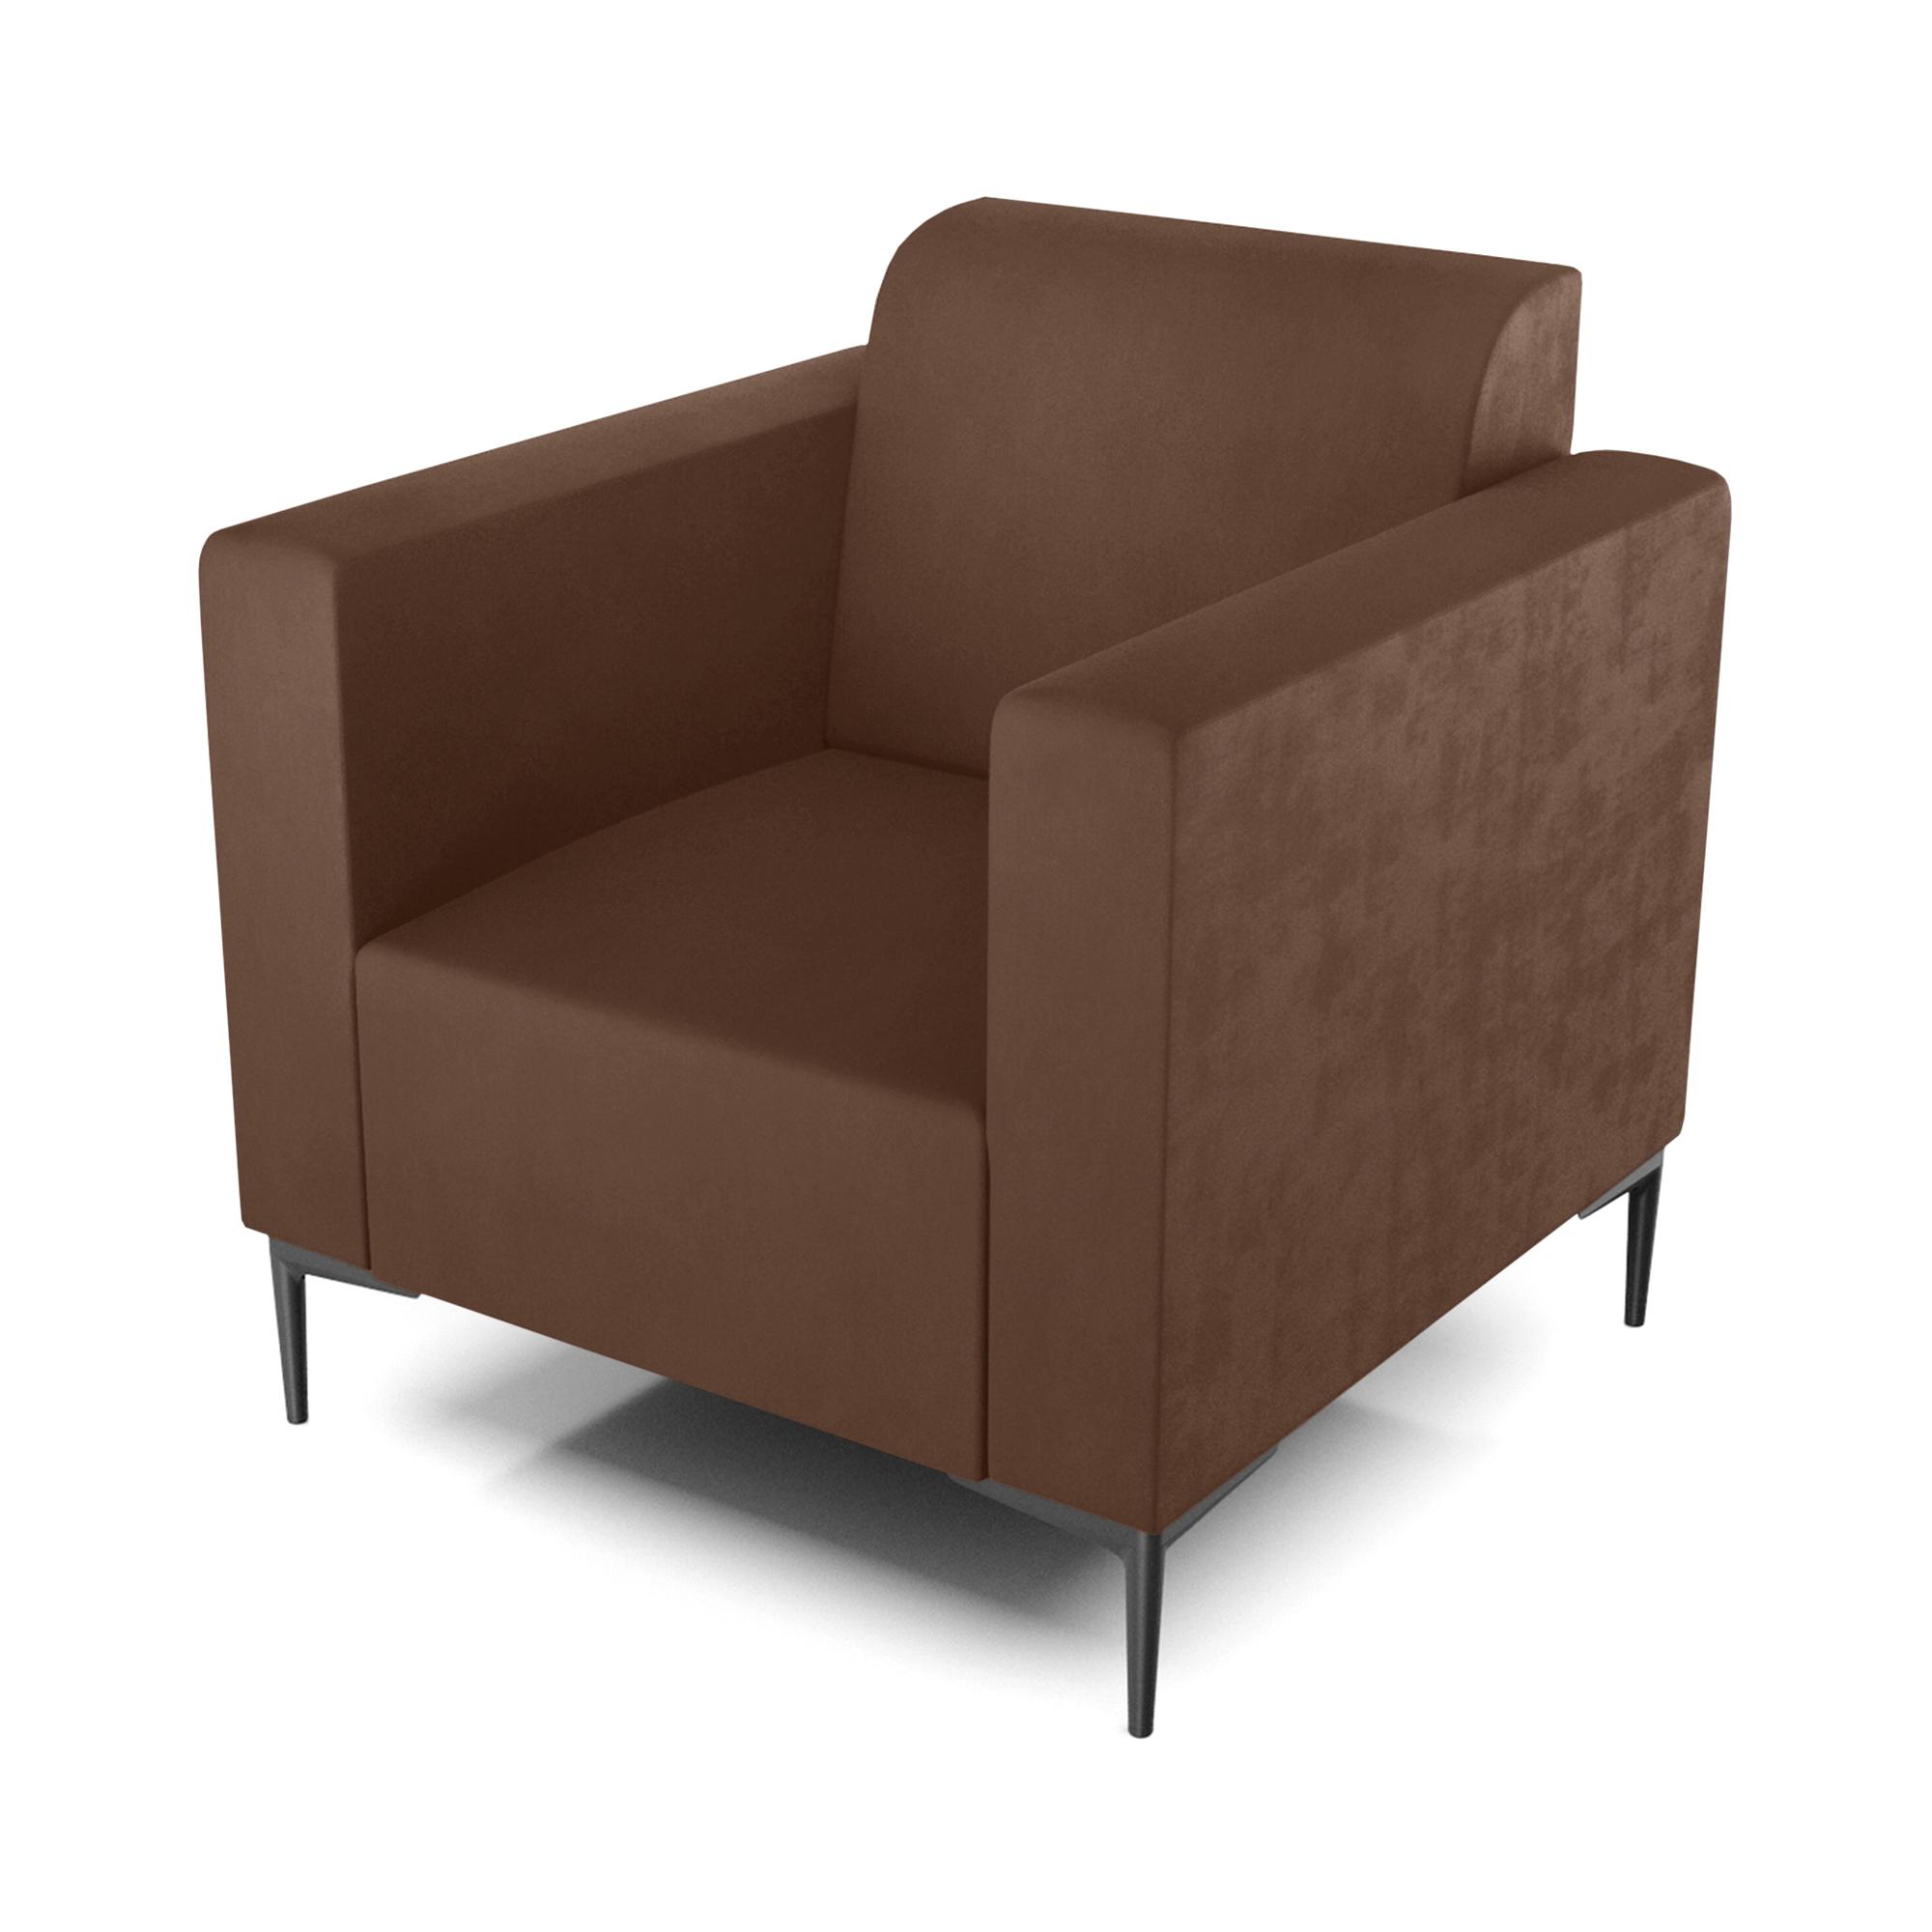 Кресло AS Тиффани 79x78x73 см какао кресло as тиффани 79x78x73 см коричневый